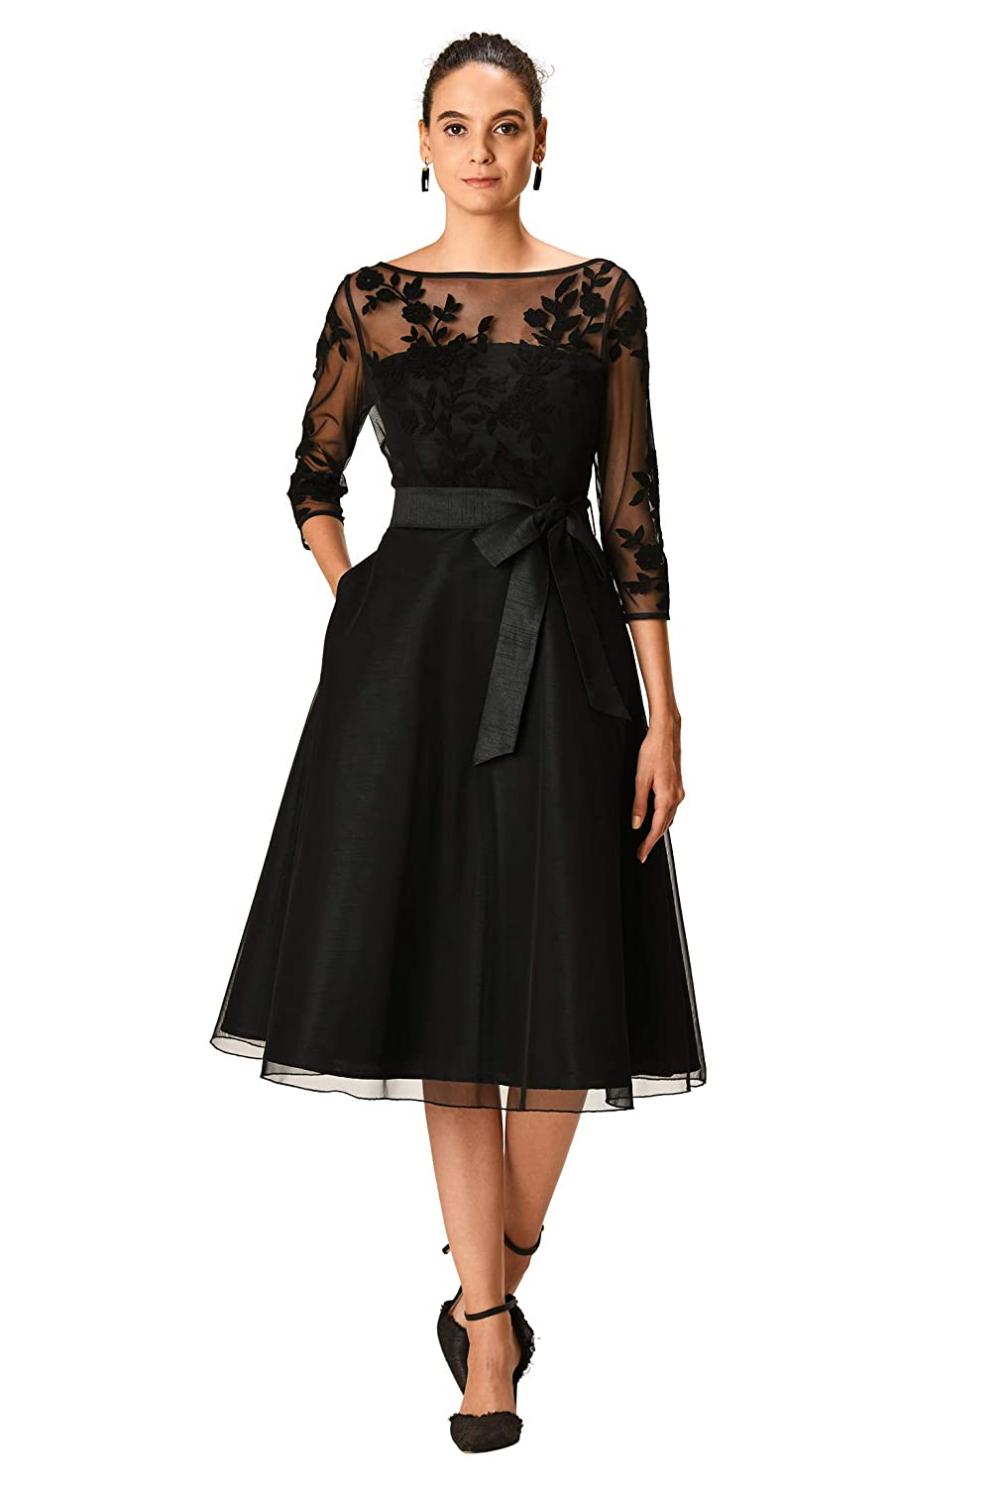 60s 70s Plus Size Dresses Clothing Costumes In 2021 1950s Cocktail Dress Fashion Clothes Women Black Tea Length Dress [ 1486 x 1000 Pixel ]